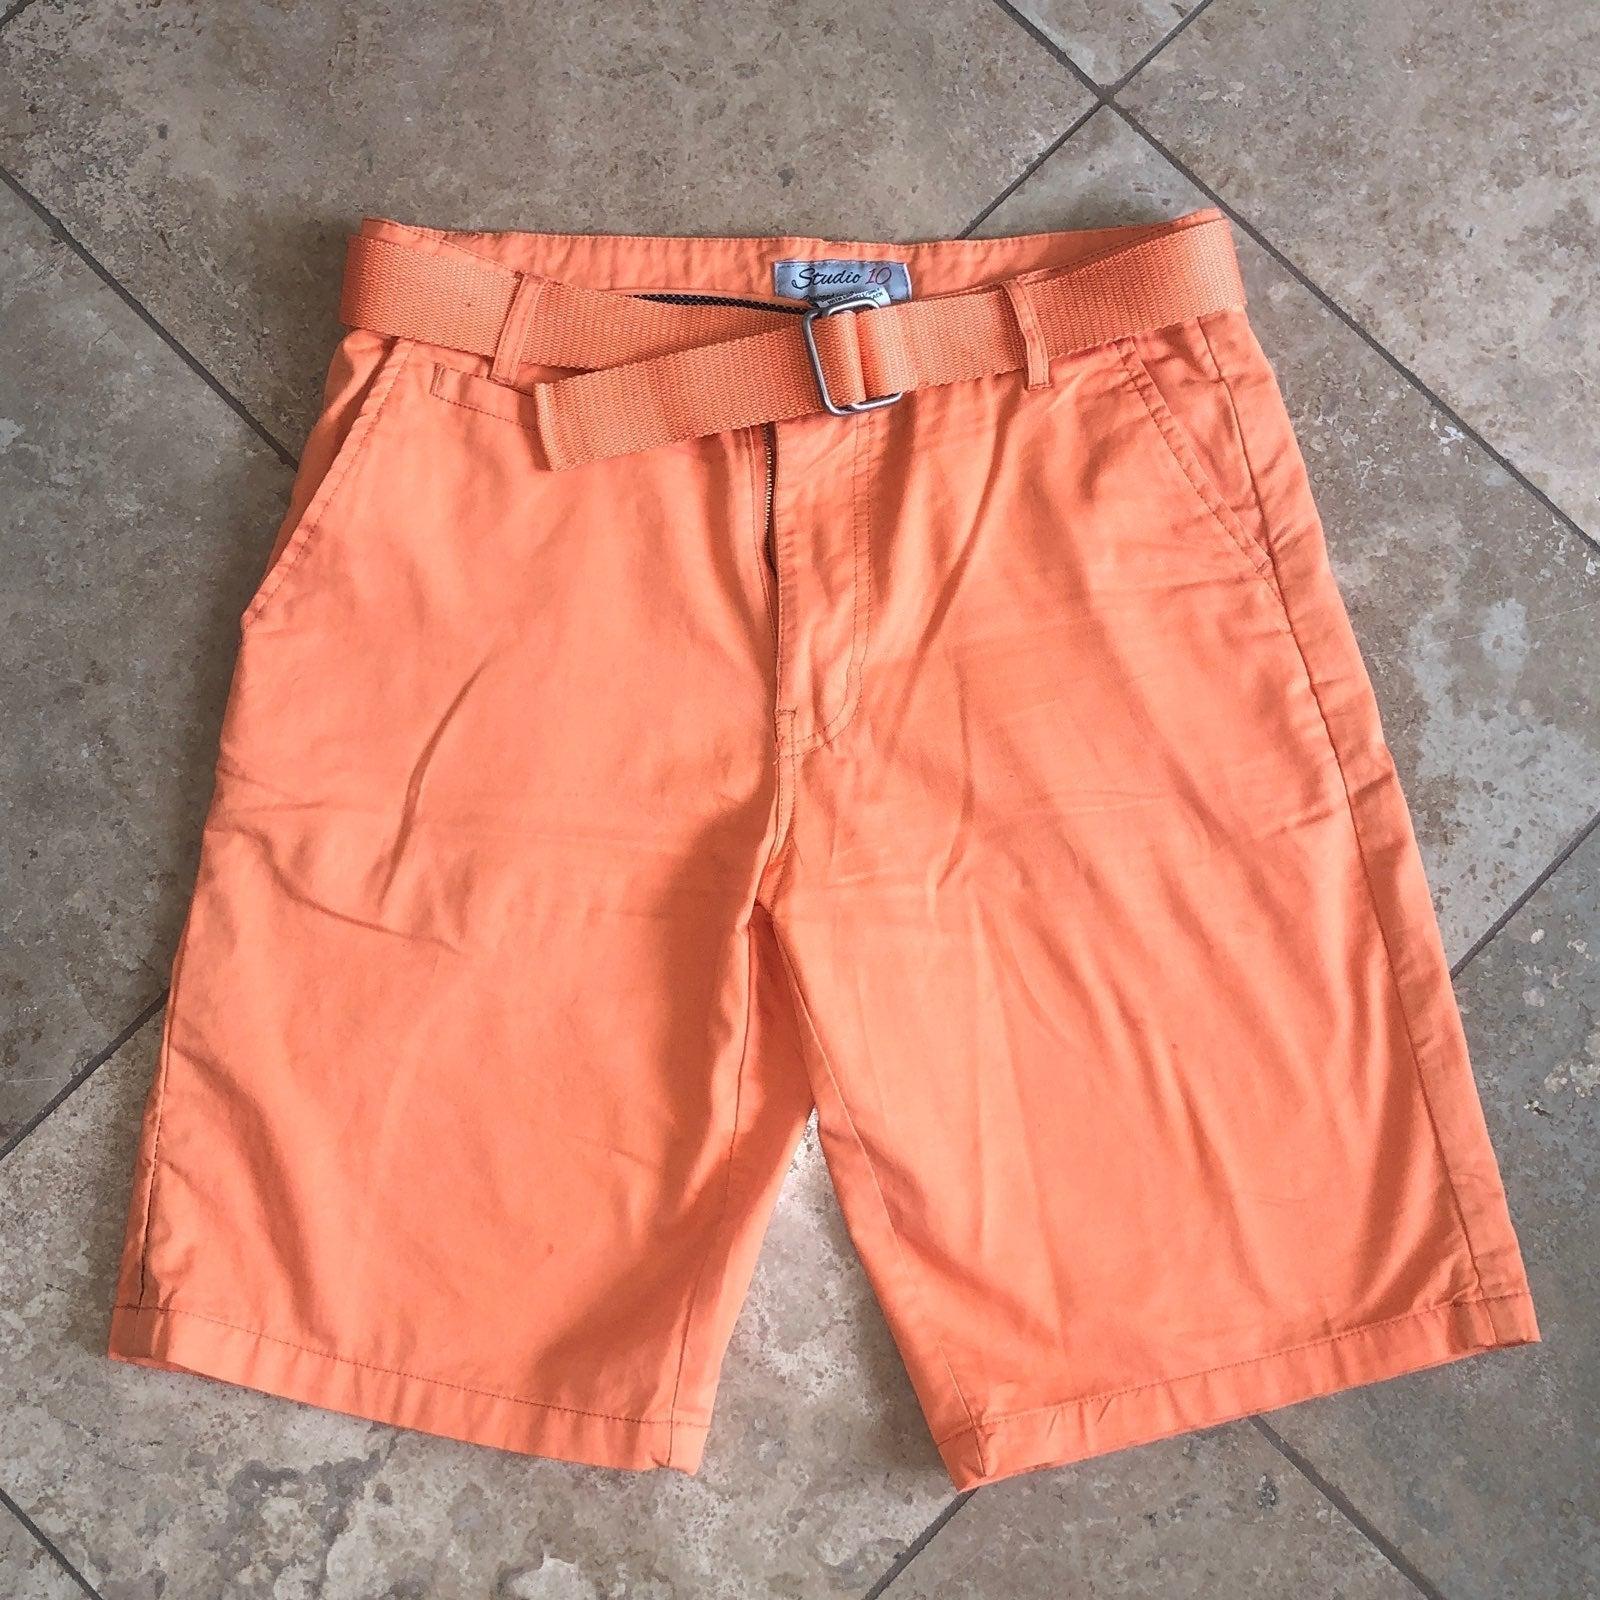 Mens Orange Chino Shorts